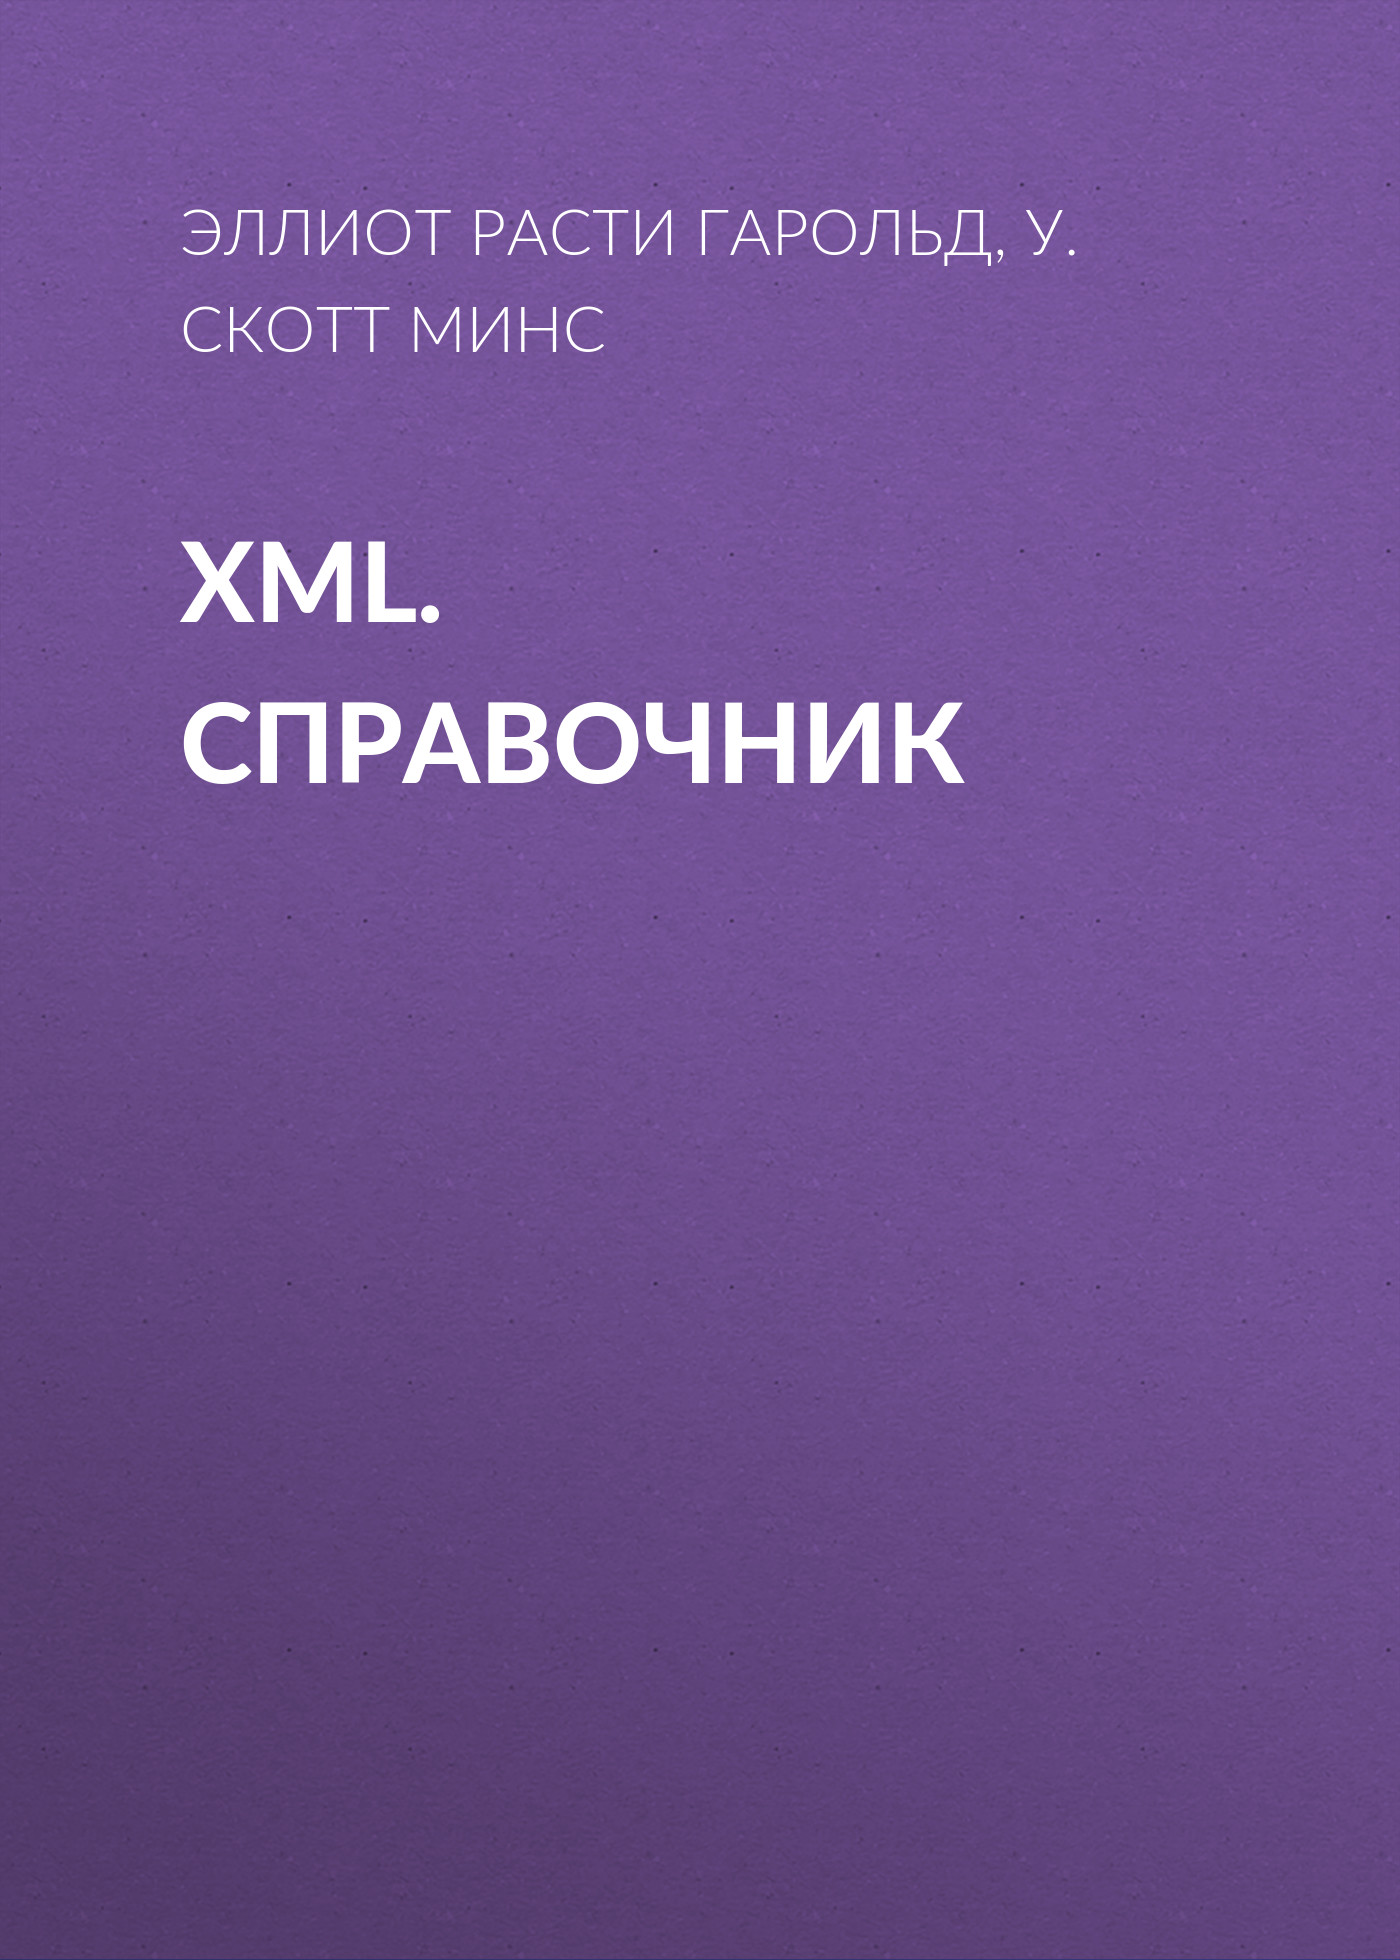 Эллиот Расти Гарольд XML. Справочник rigoberto garcia foundations book ii understanding sql server 2005 supporting technology xml xslt xquery xpath ms schemas dtd s namespaces